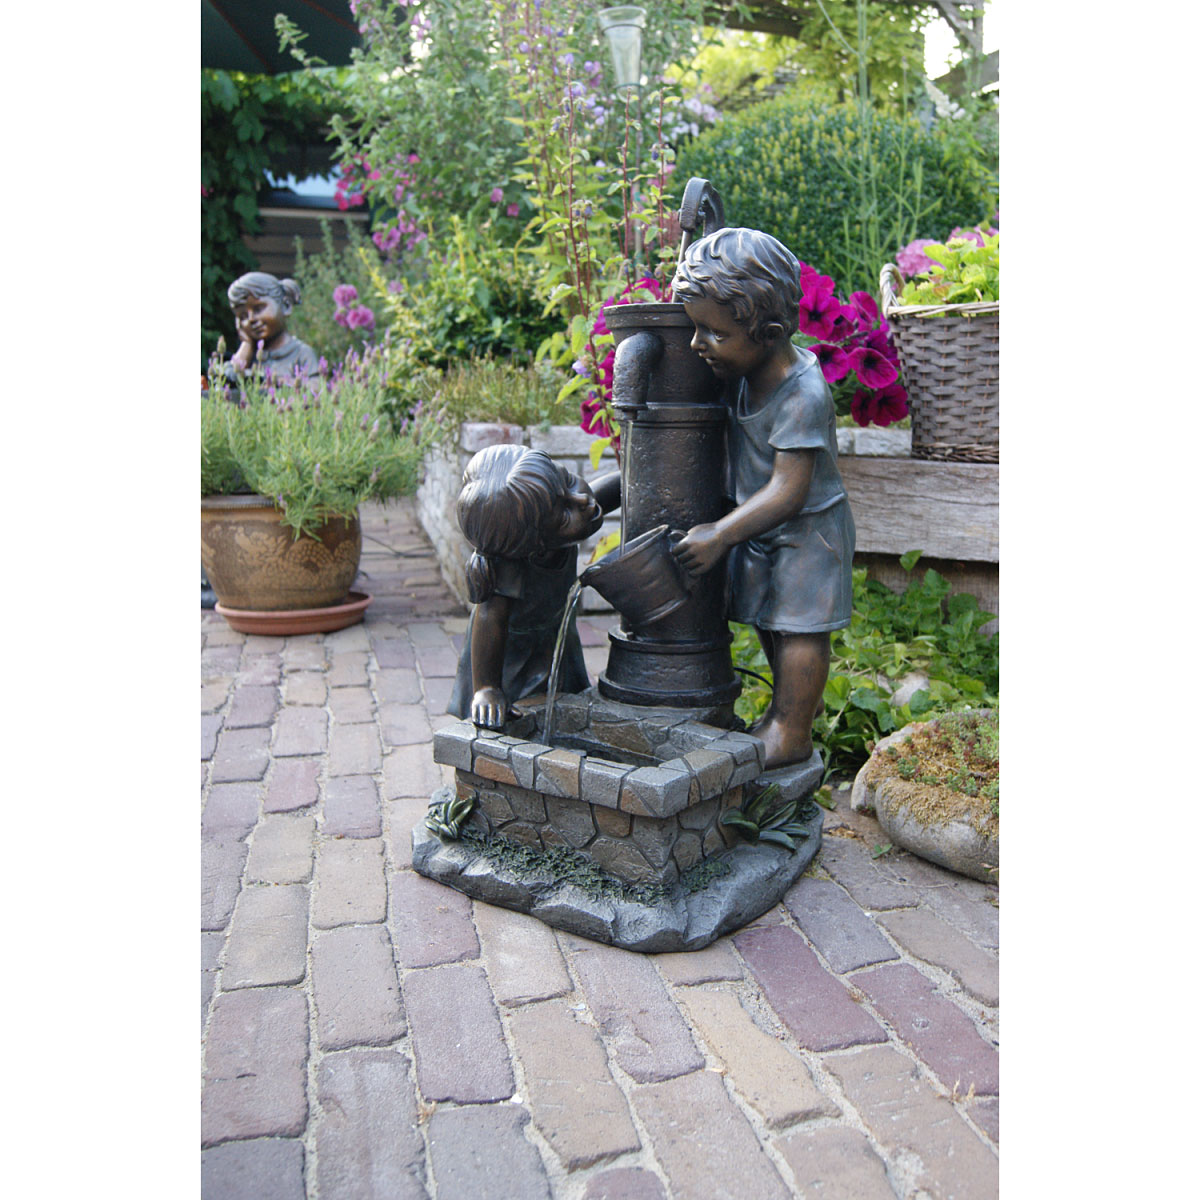 "Gartendekoration - Wasserspiel Set ""Atlanta"" inkl. Pumpe  - Onlineshop Hellweg"